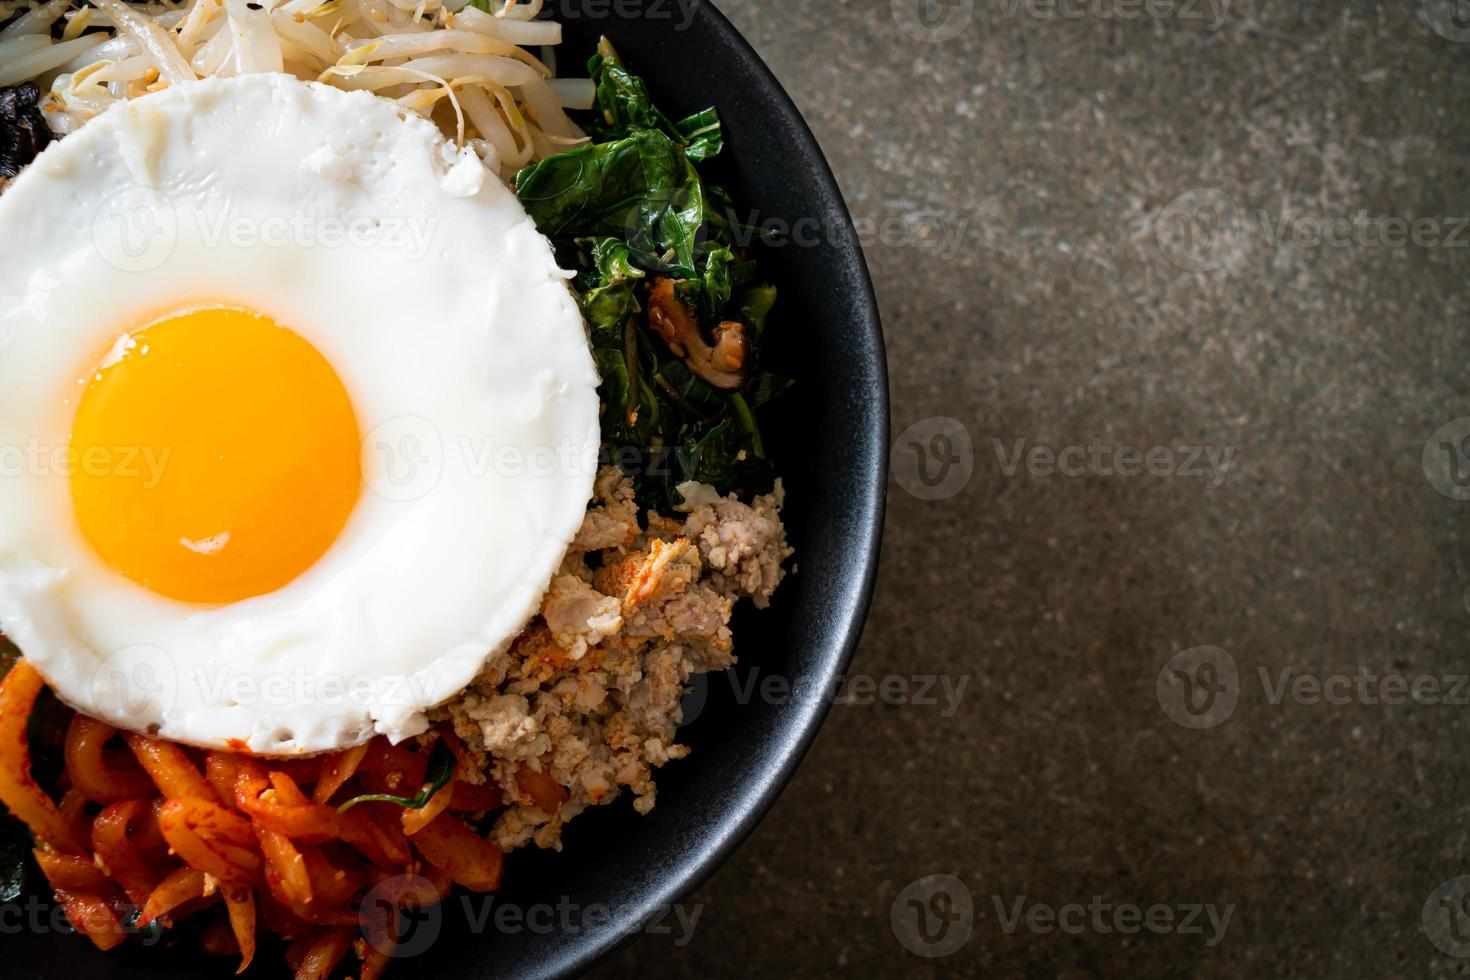 ensalada picante coreana con arroz - comida tradicional coreana, bibimbap foto